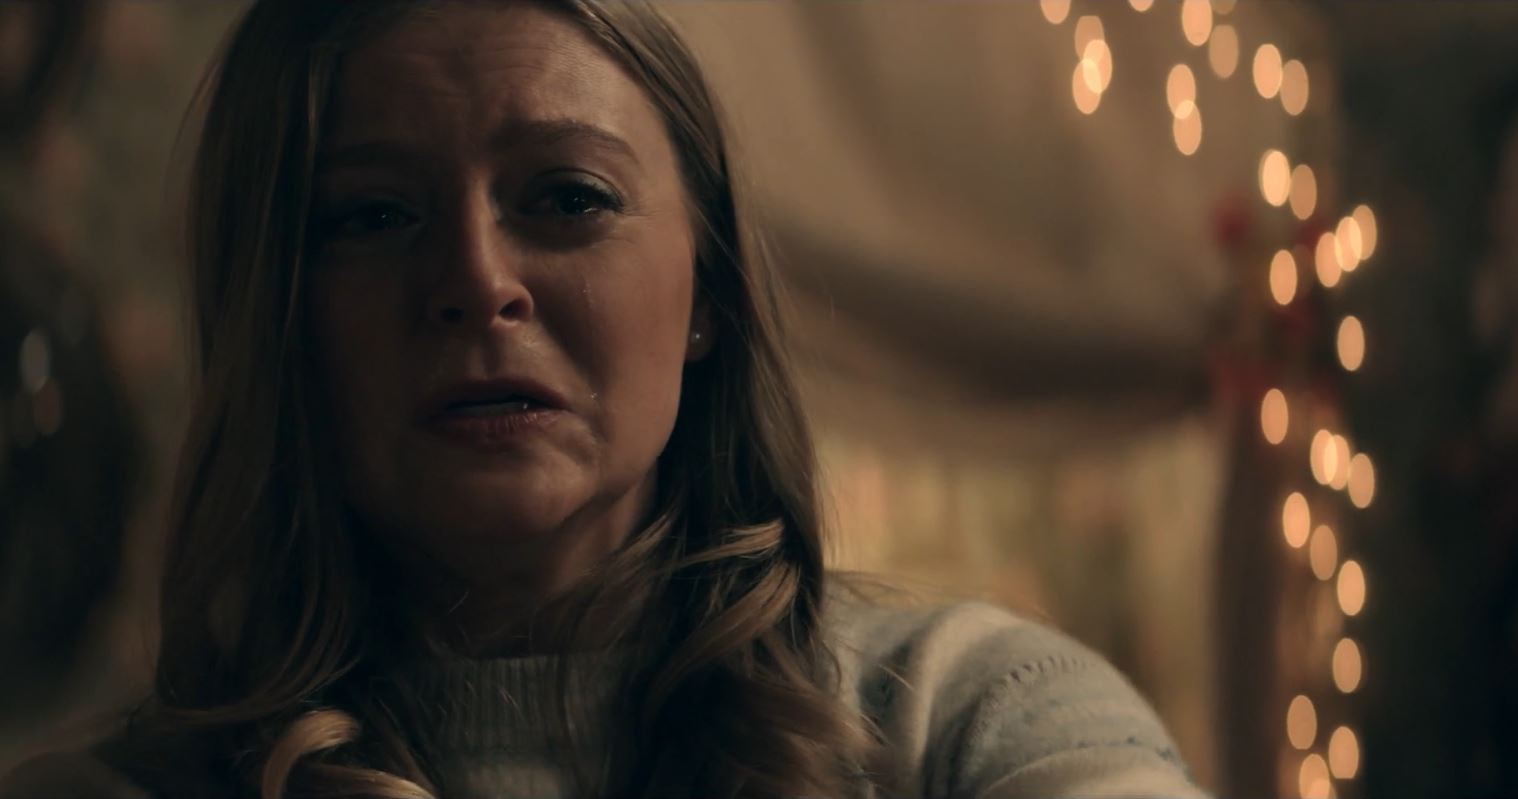 TV Show Review: Prodigal Son Season 2 Episode 5